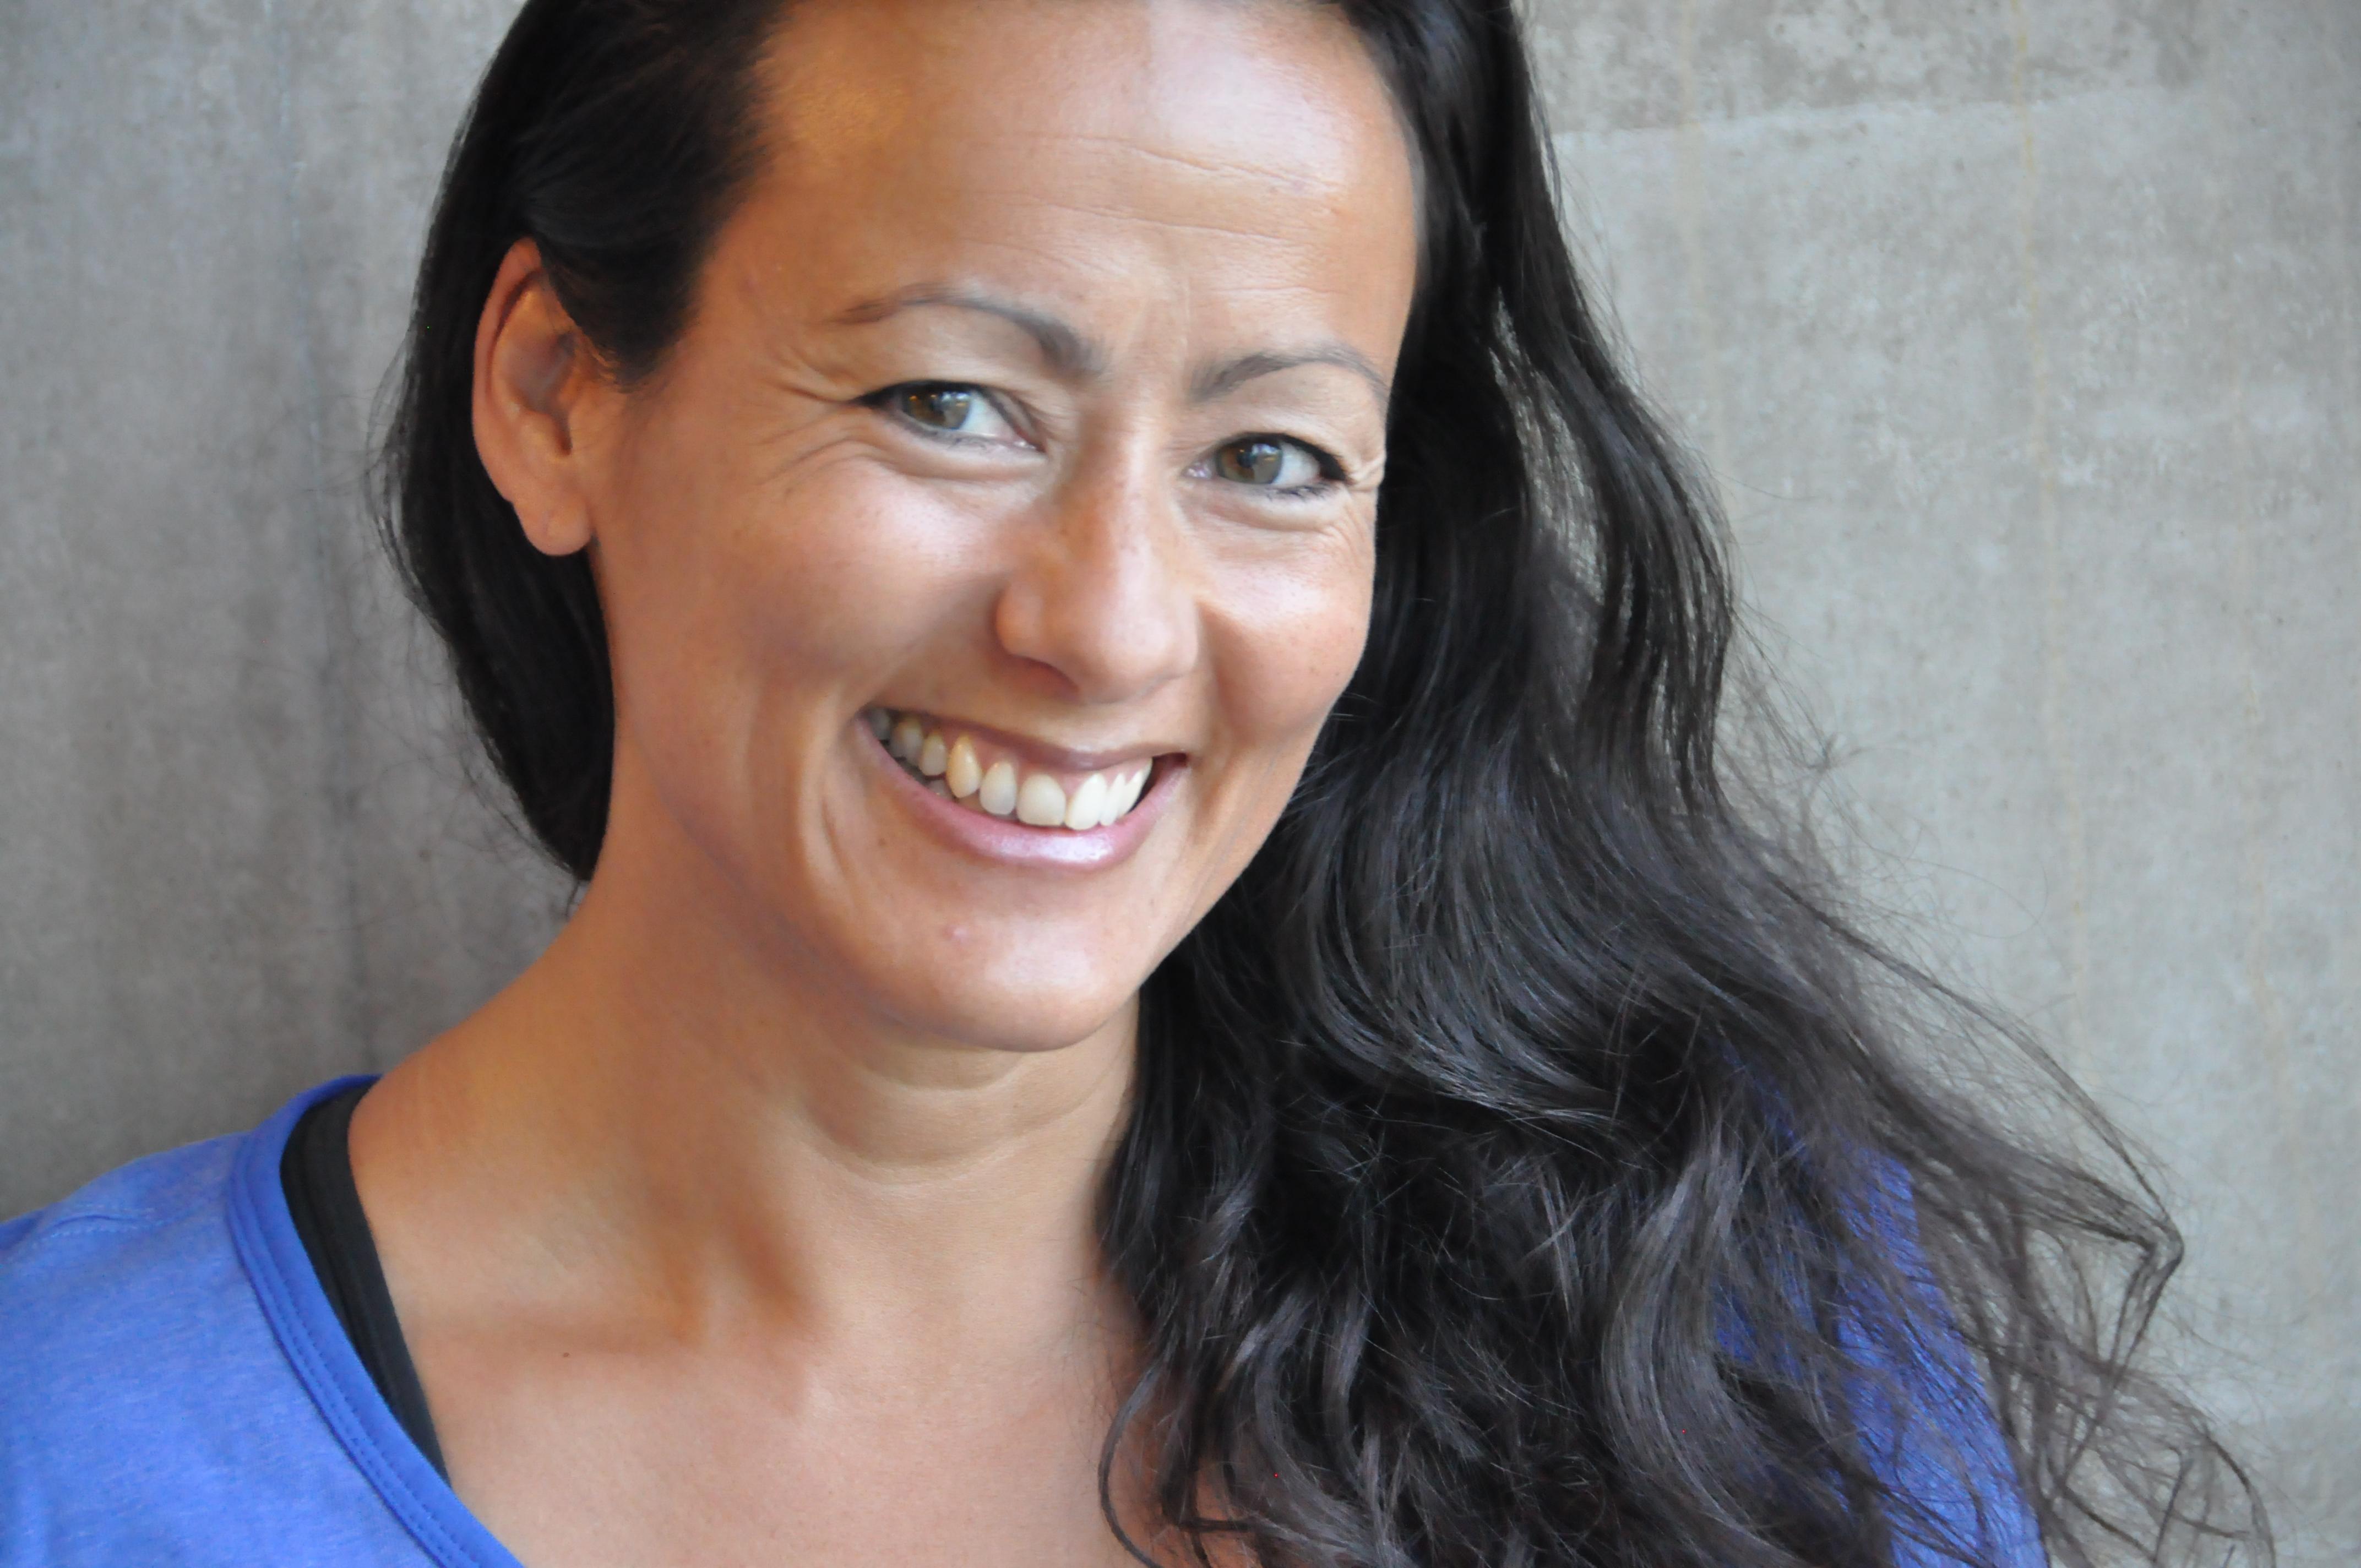 Silvia Kristensen